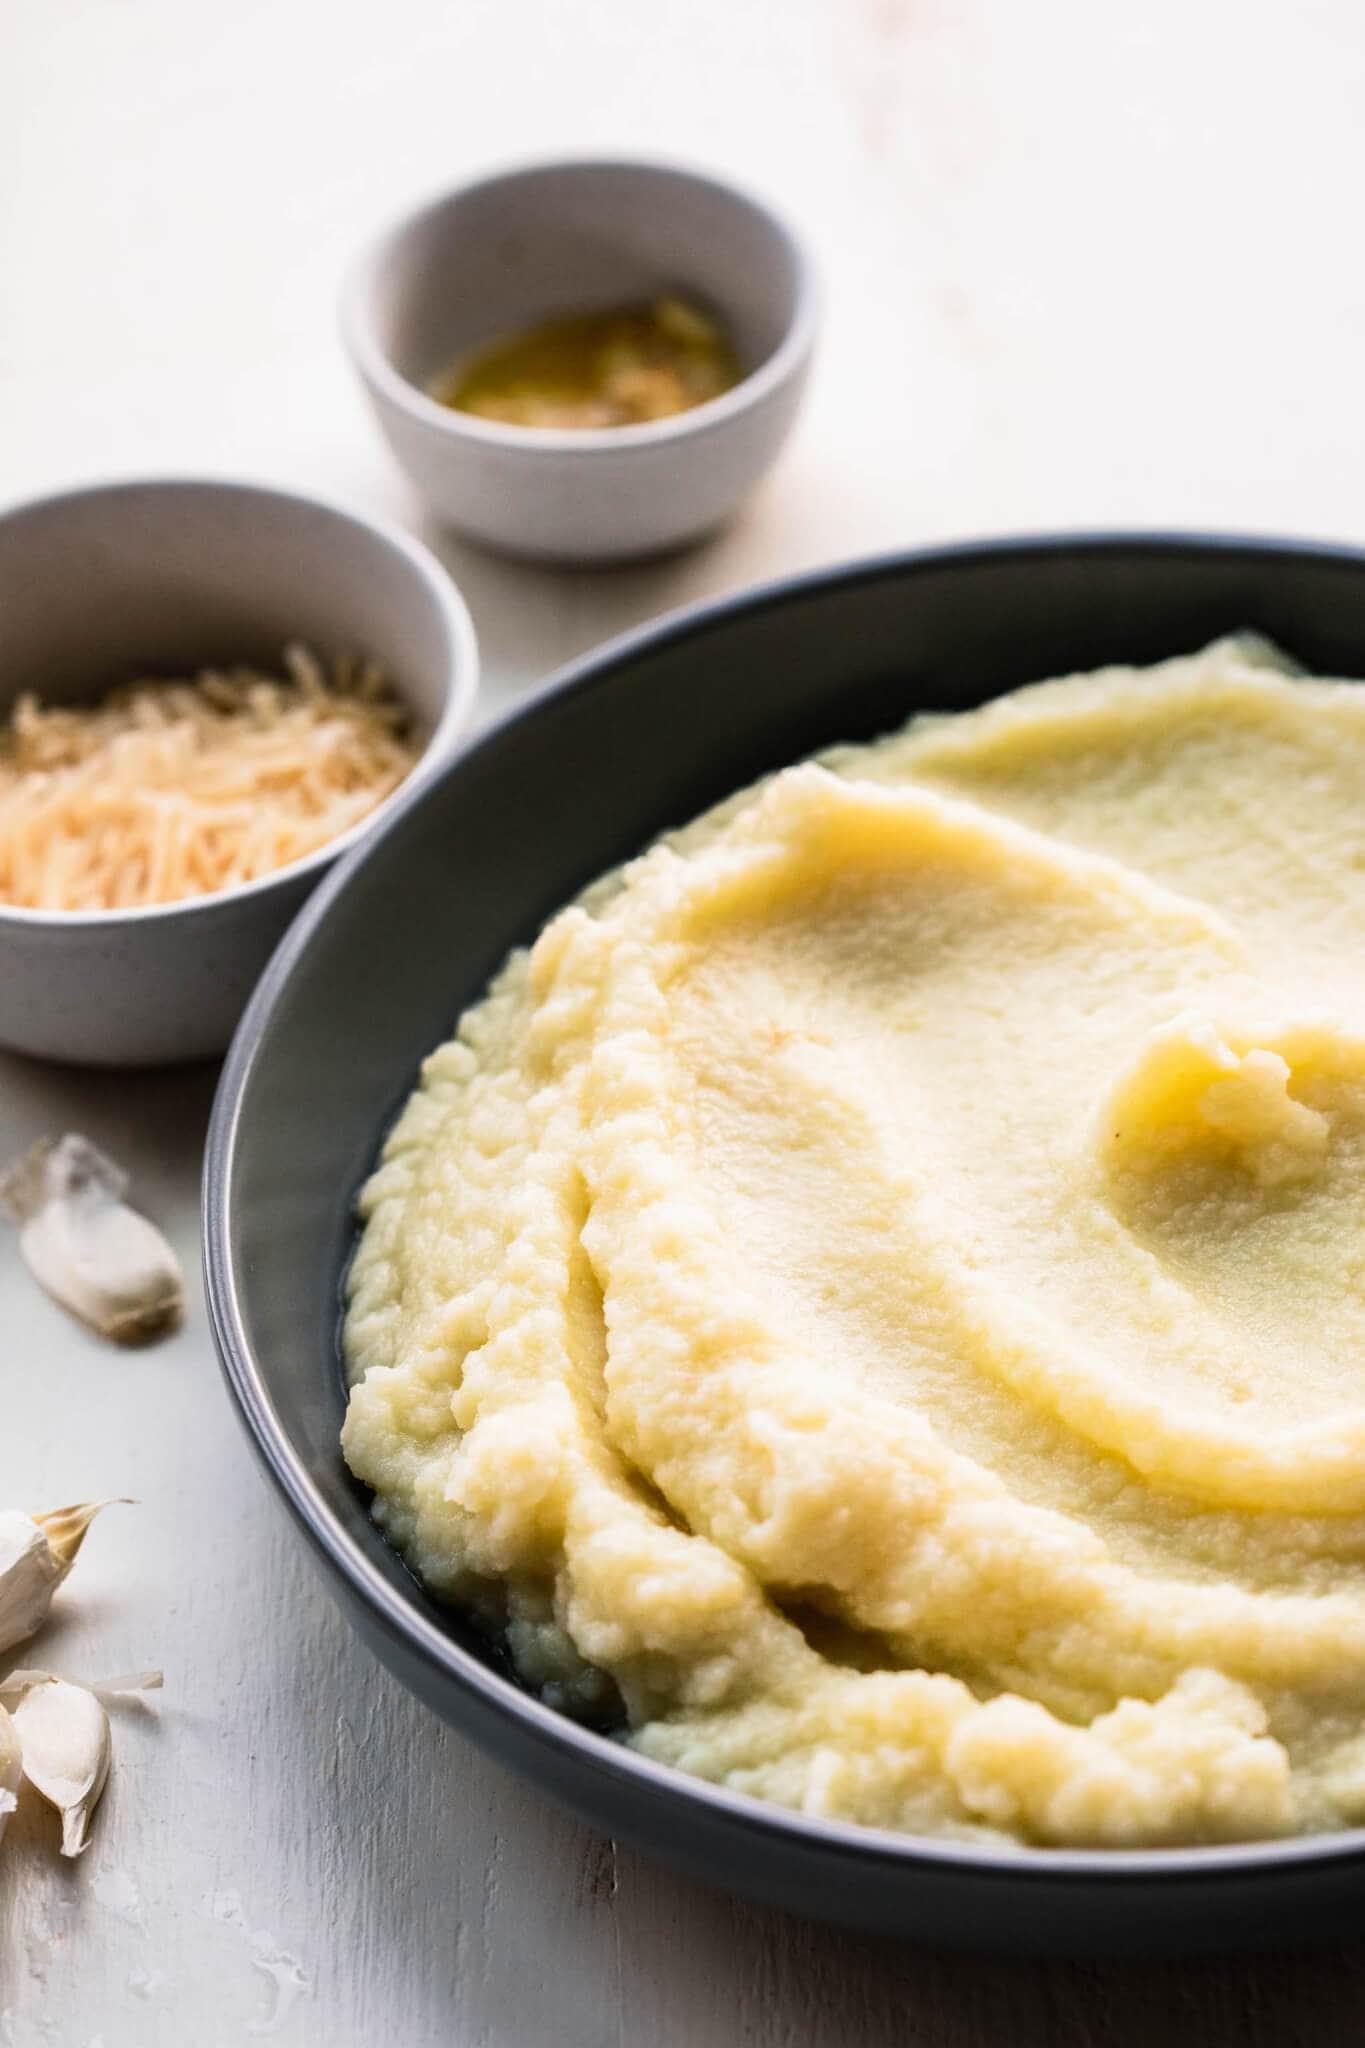 Ingredients for garlic mashed cauliflower